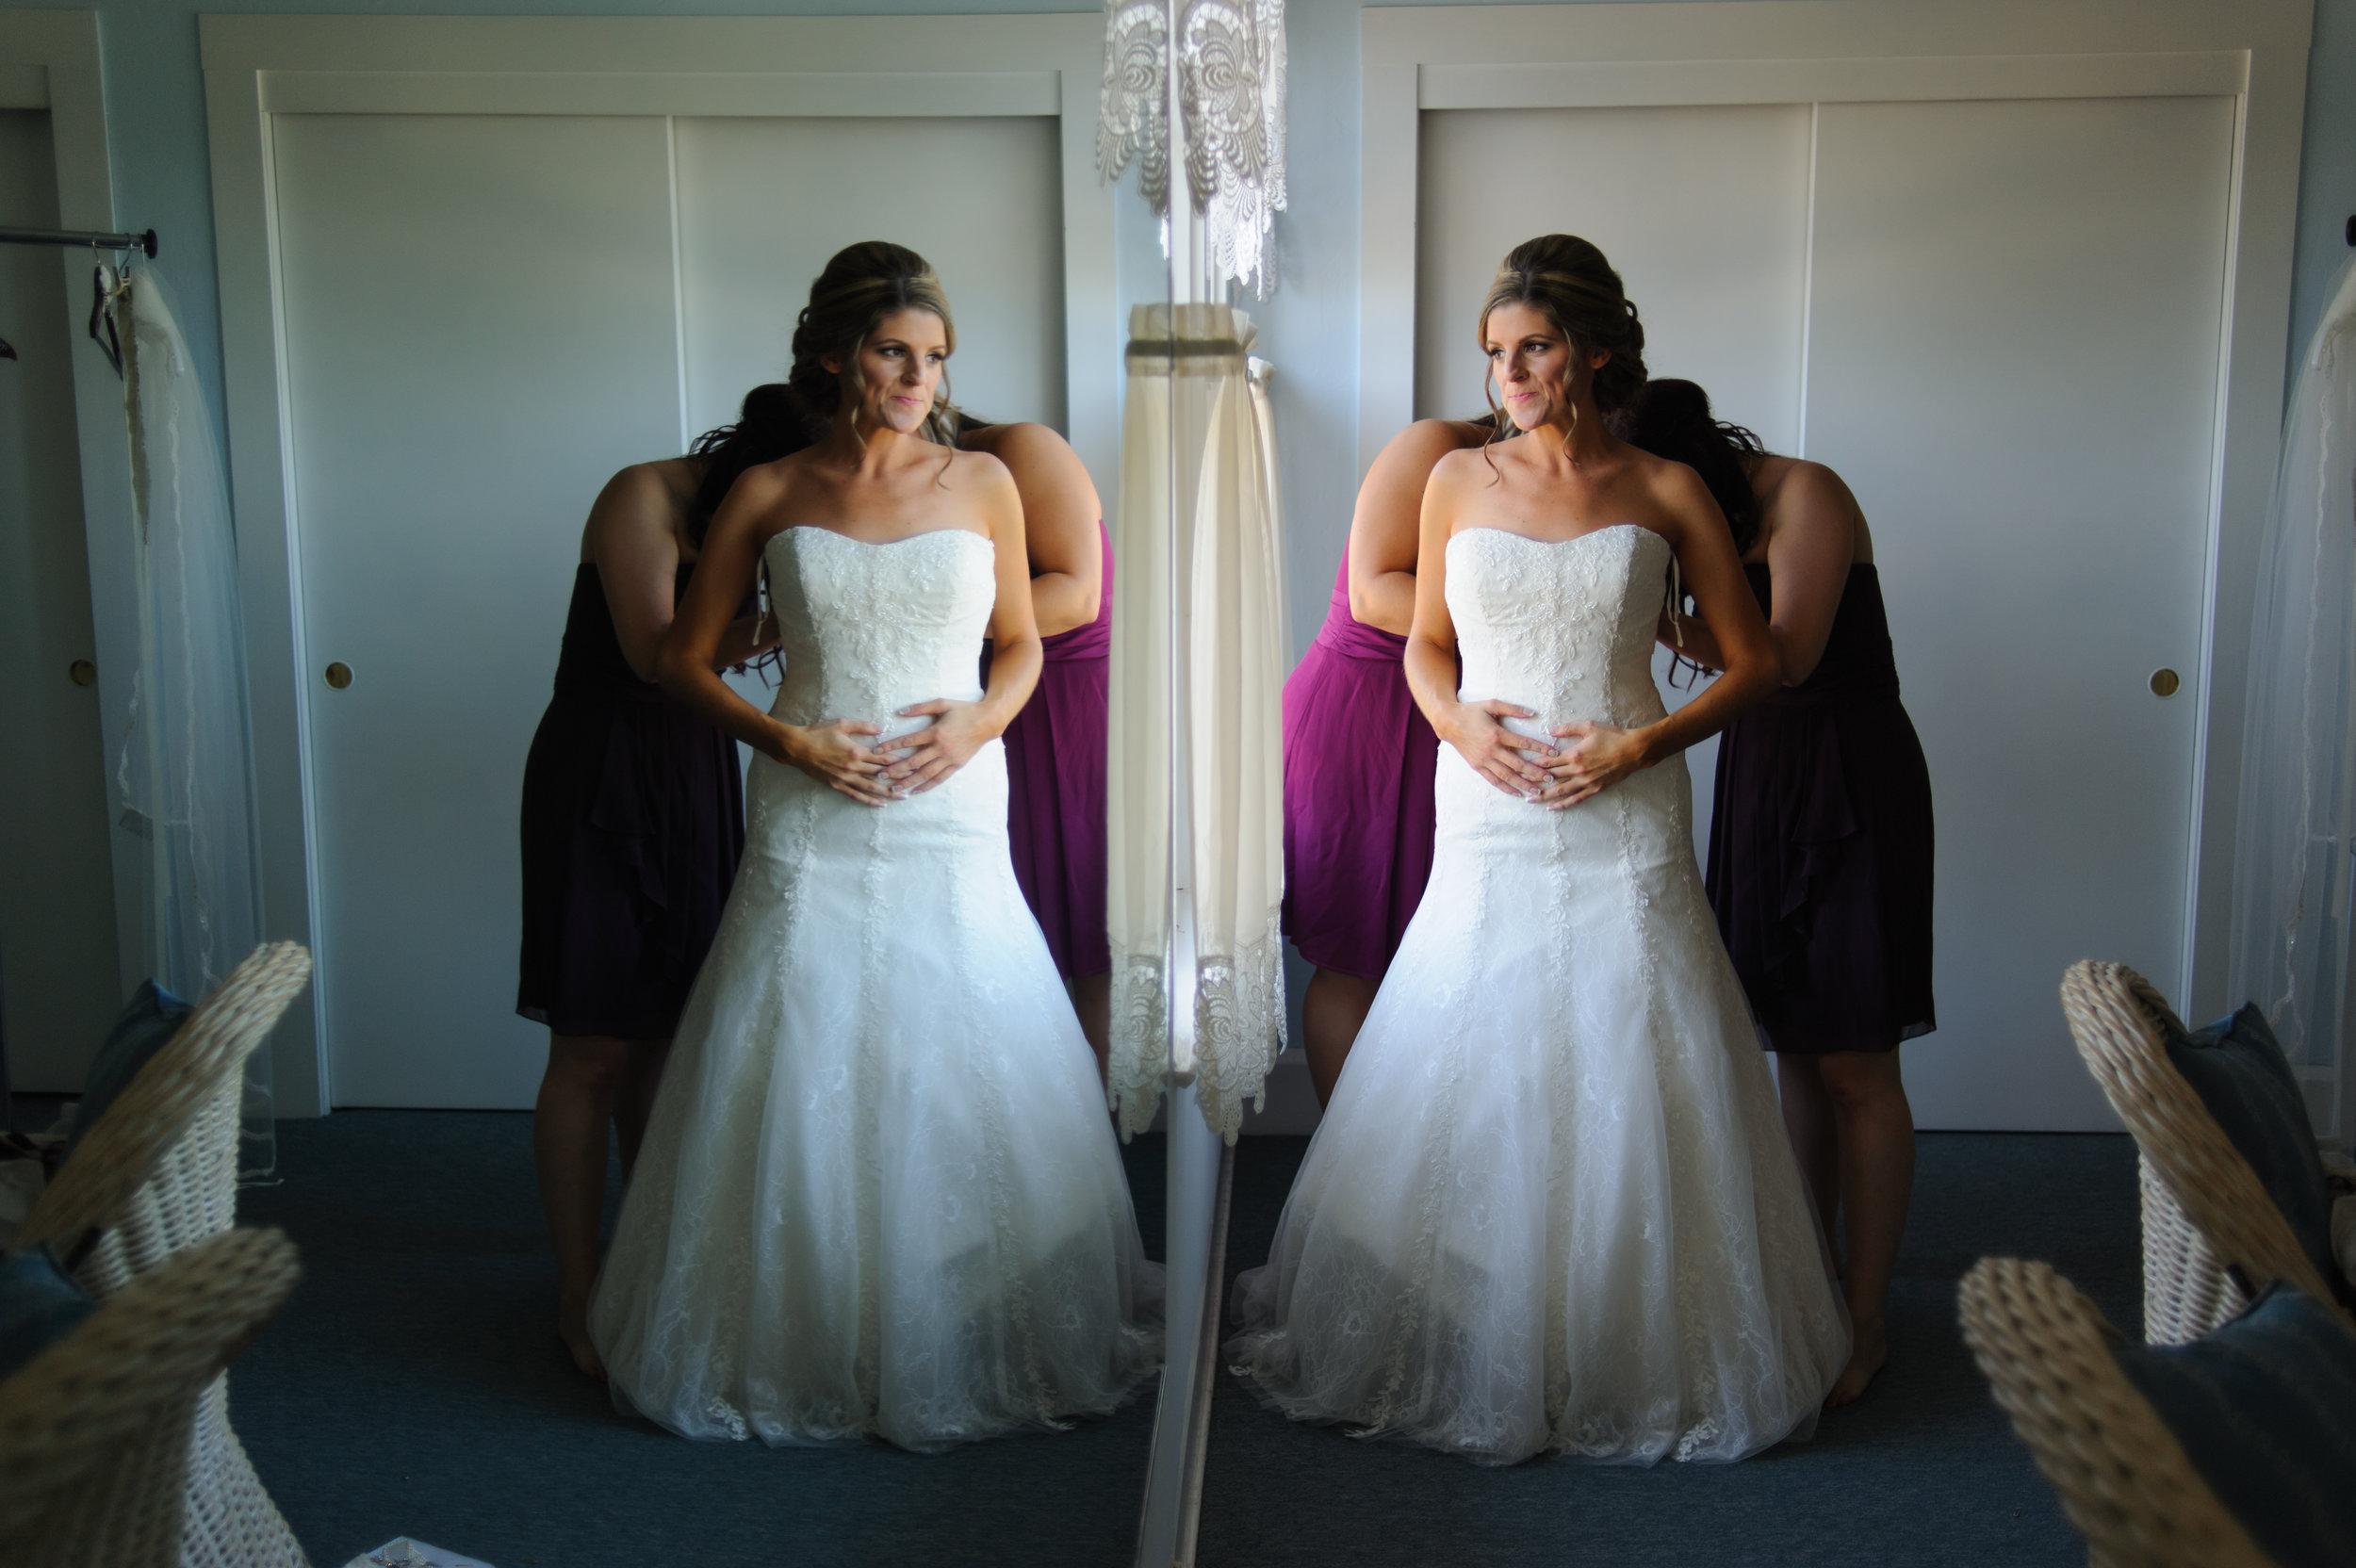 susan-brad-003-sacramento-wedding-photographer-katherine-nicole-photography.JPG